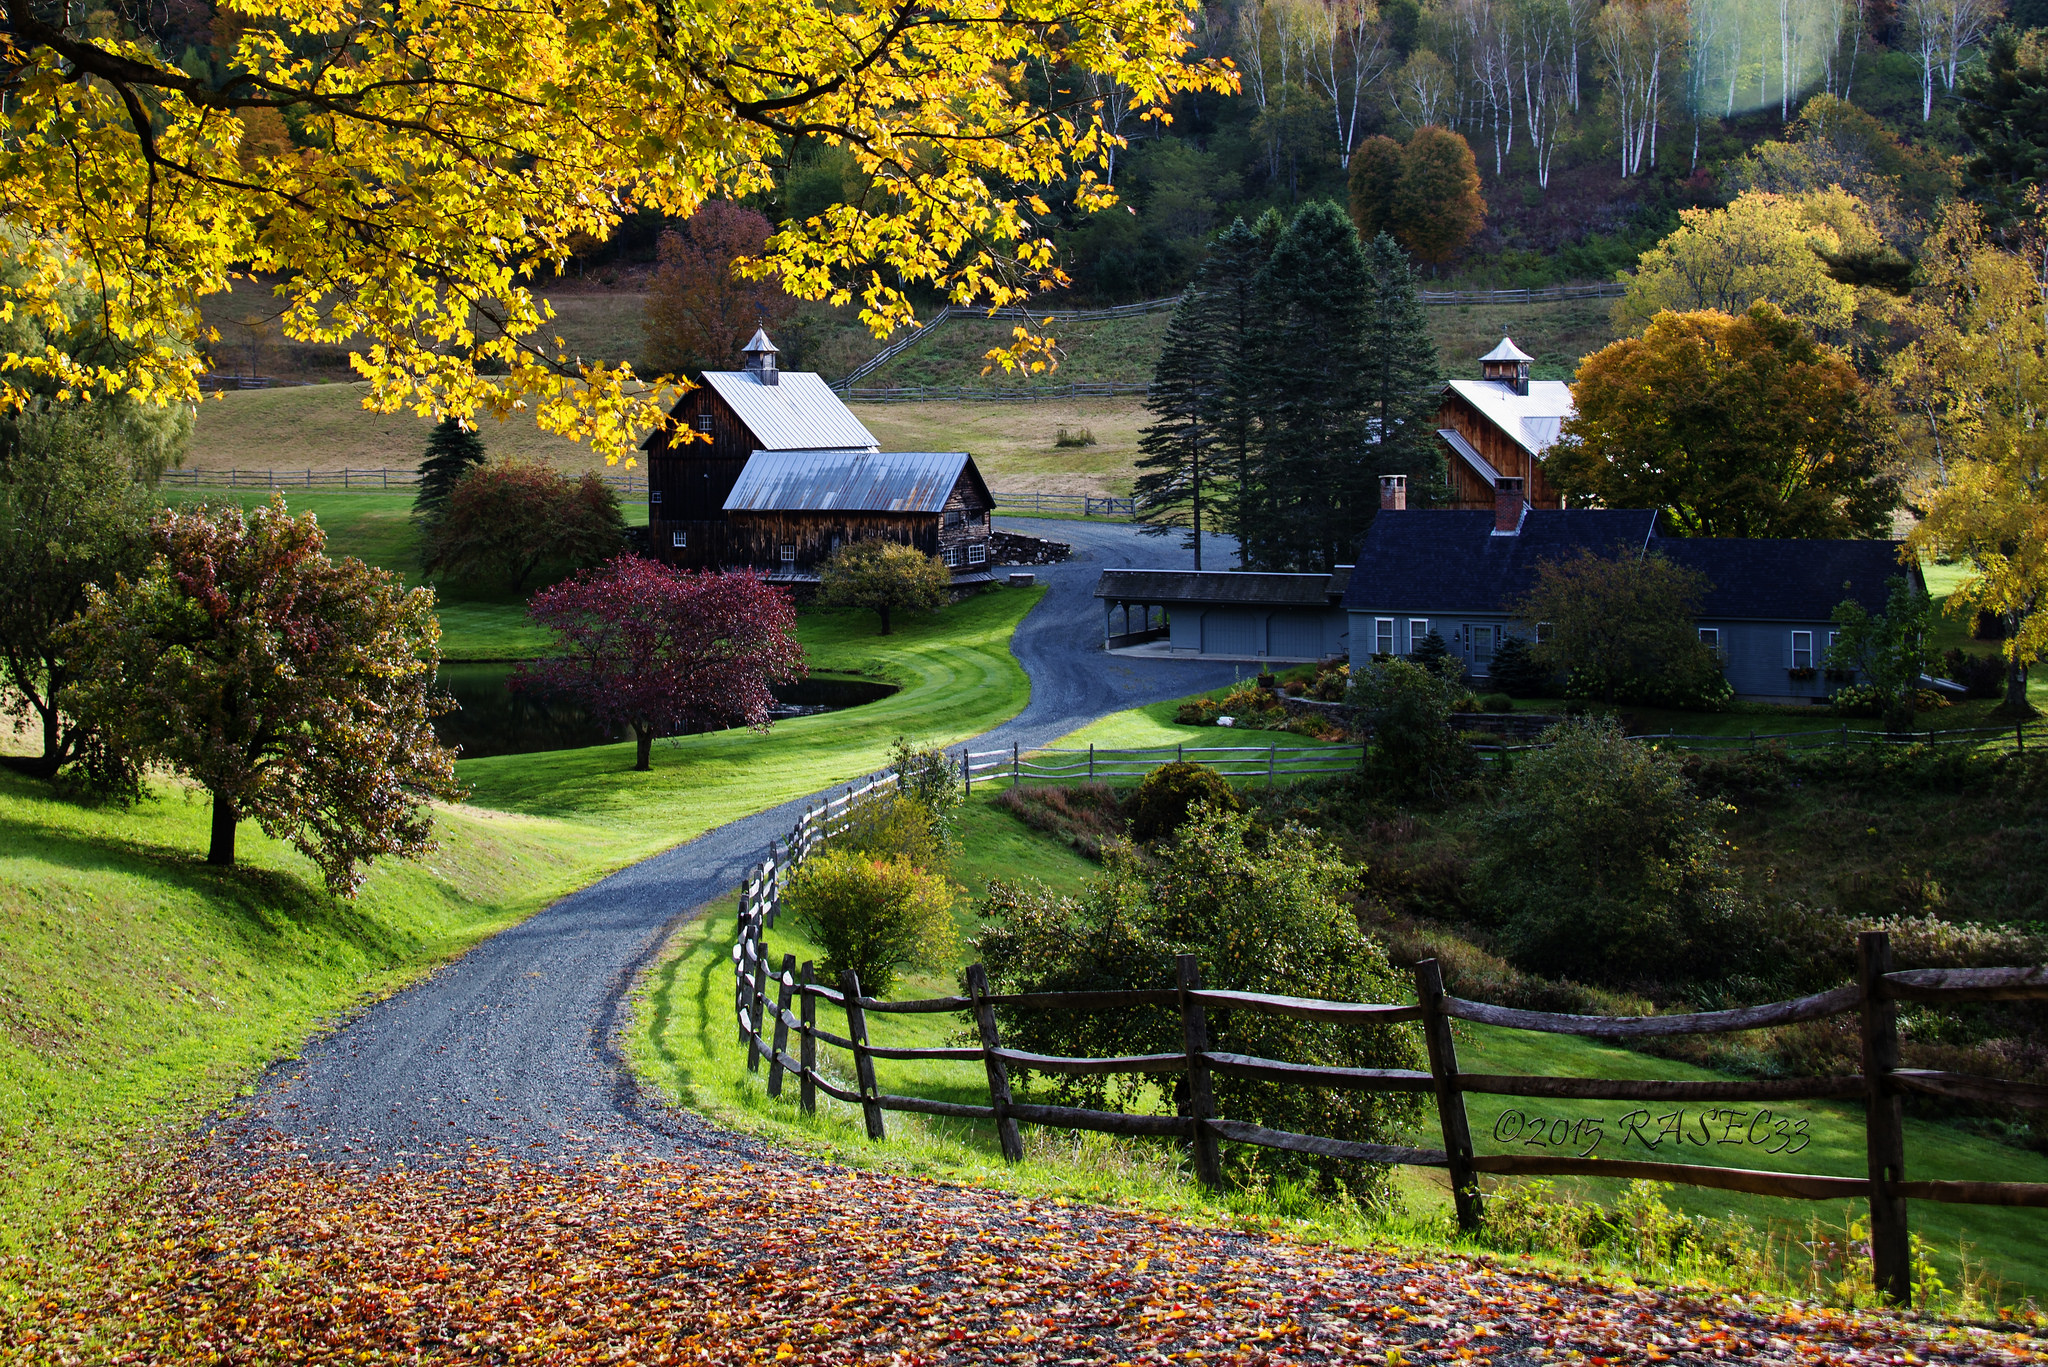 Farmhouse in Sleepy Hollow, Woodstock Vermont, USA